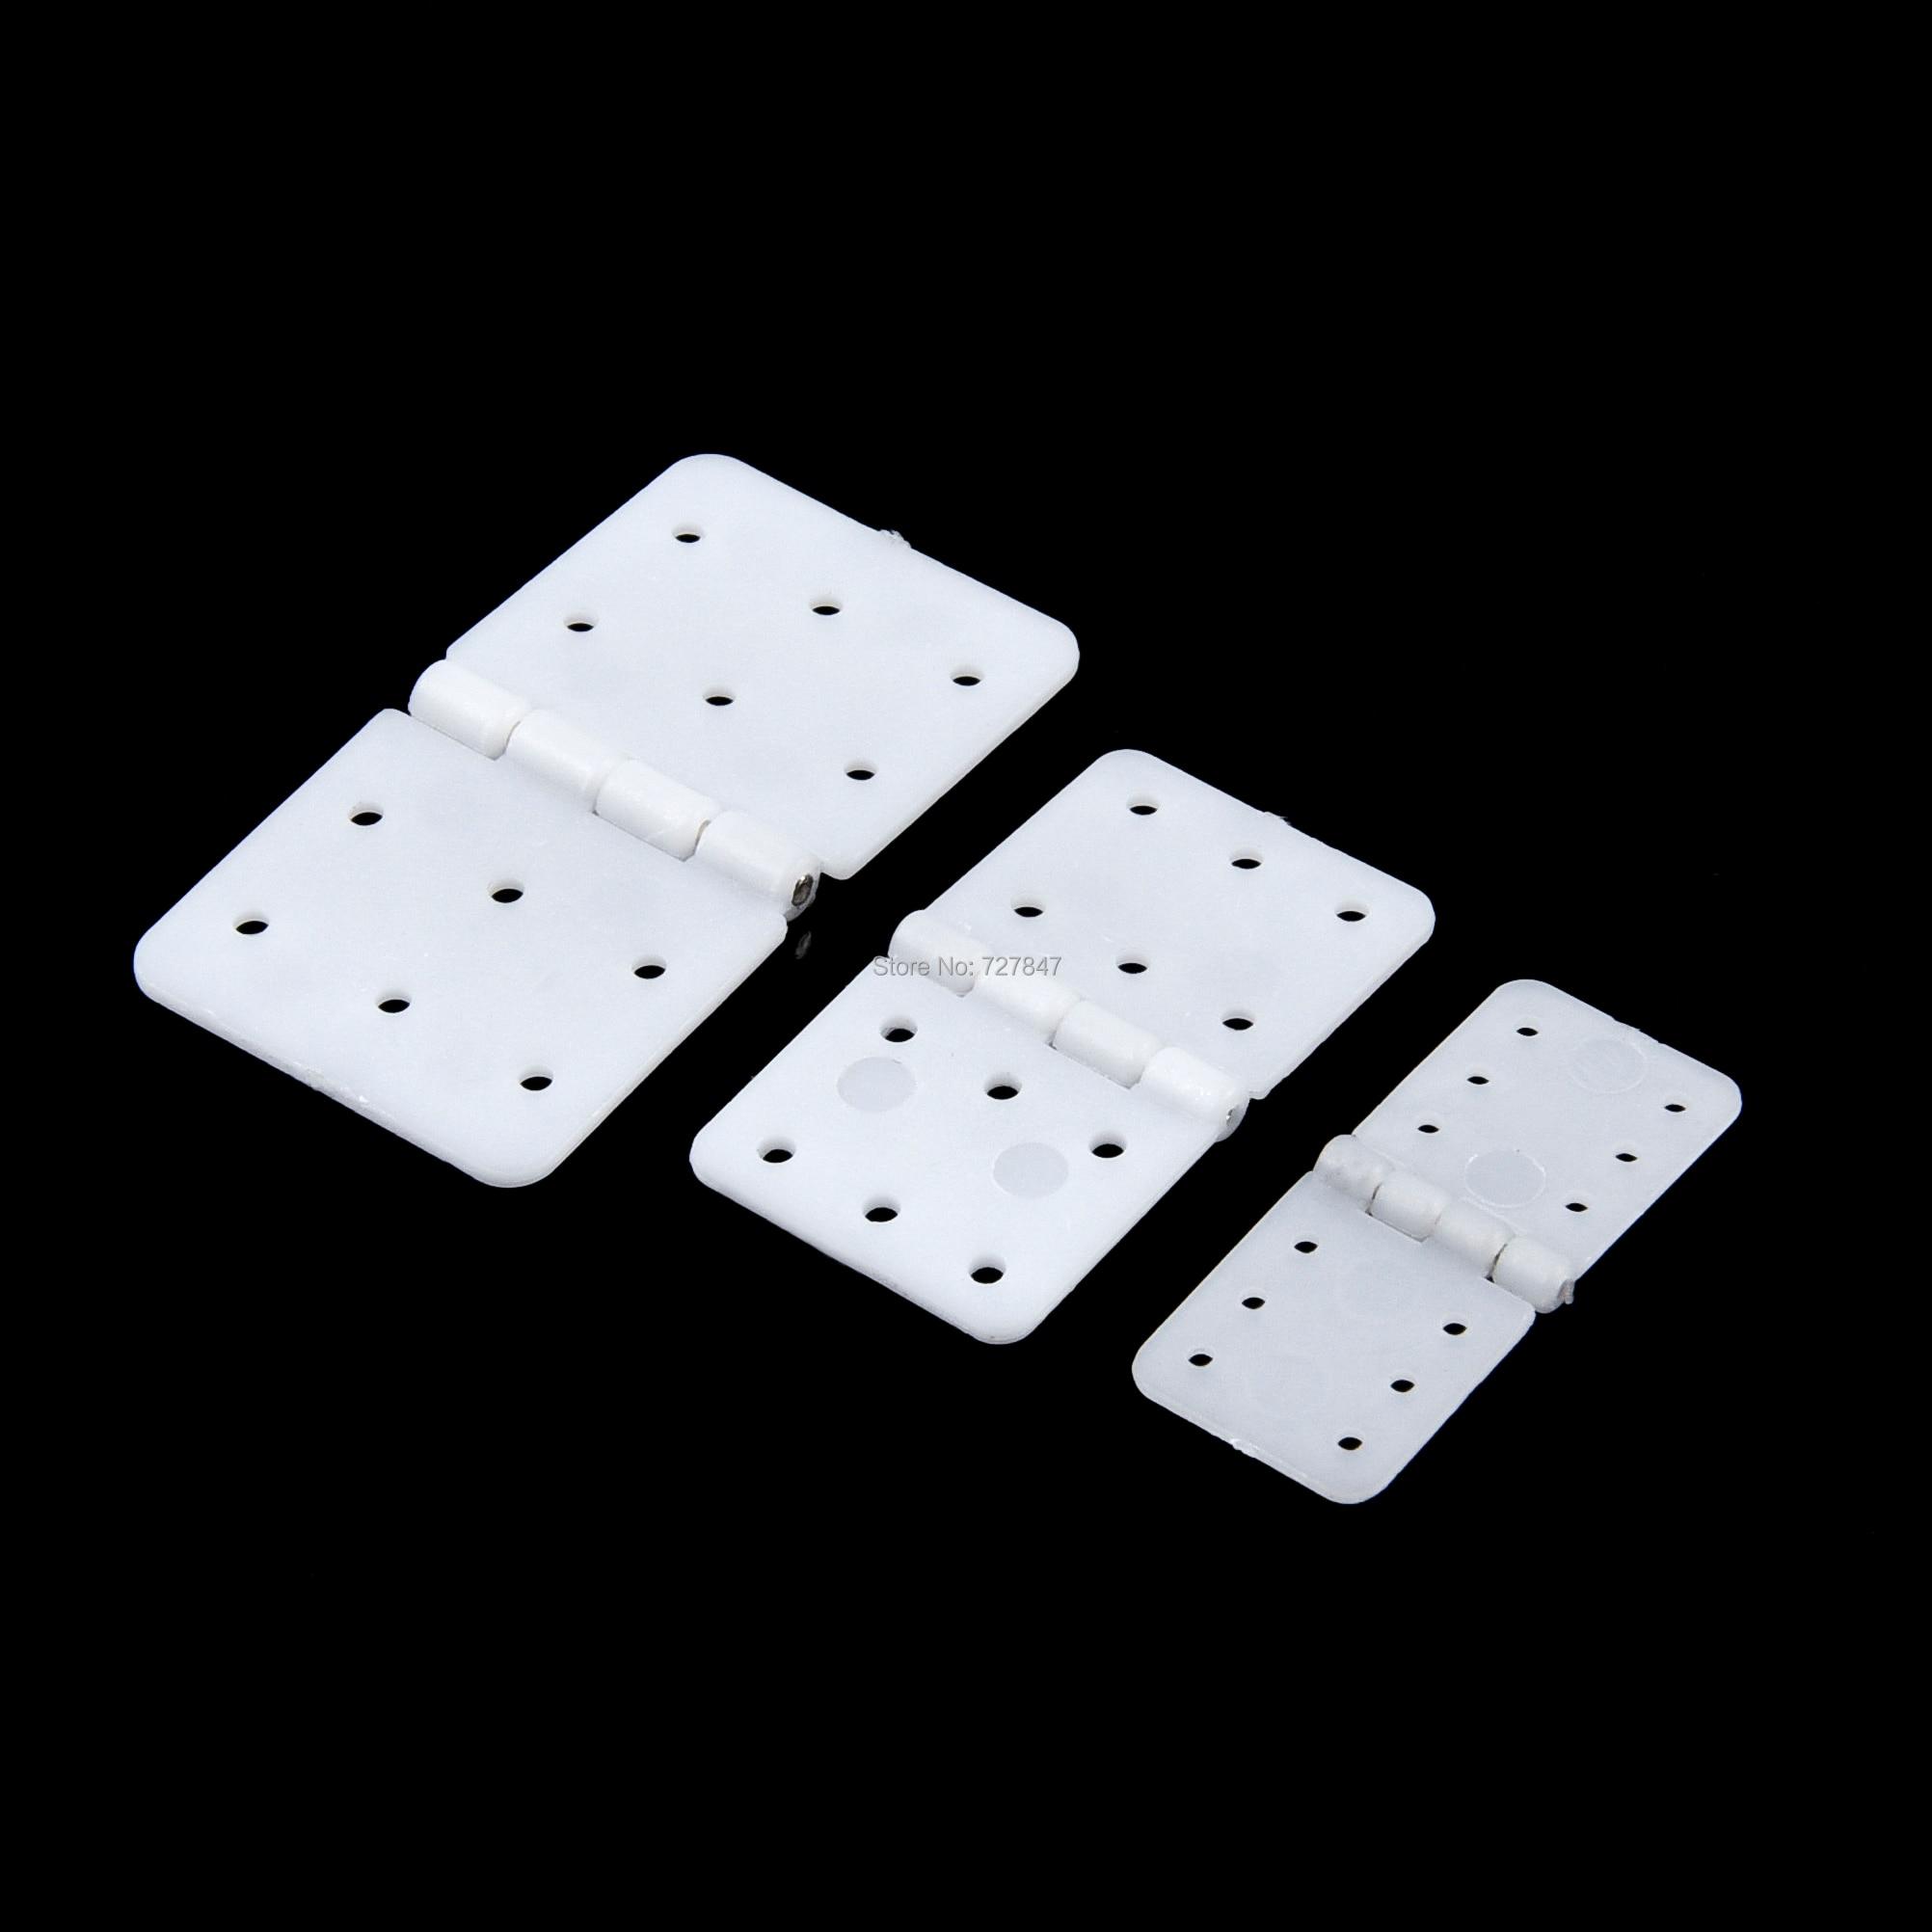 20pcs 30pcs 40pcs Nylon & Pinned Hinge 20x36mm / 16x29mm / 12x24mm For RC Airplane Plane Parts Model Replacement